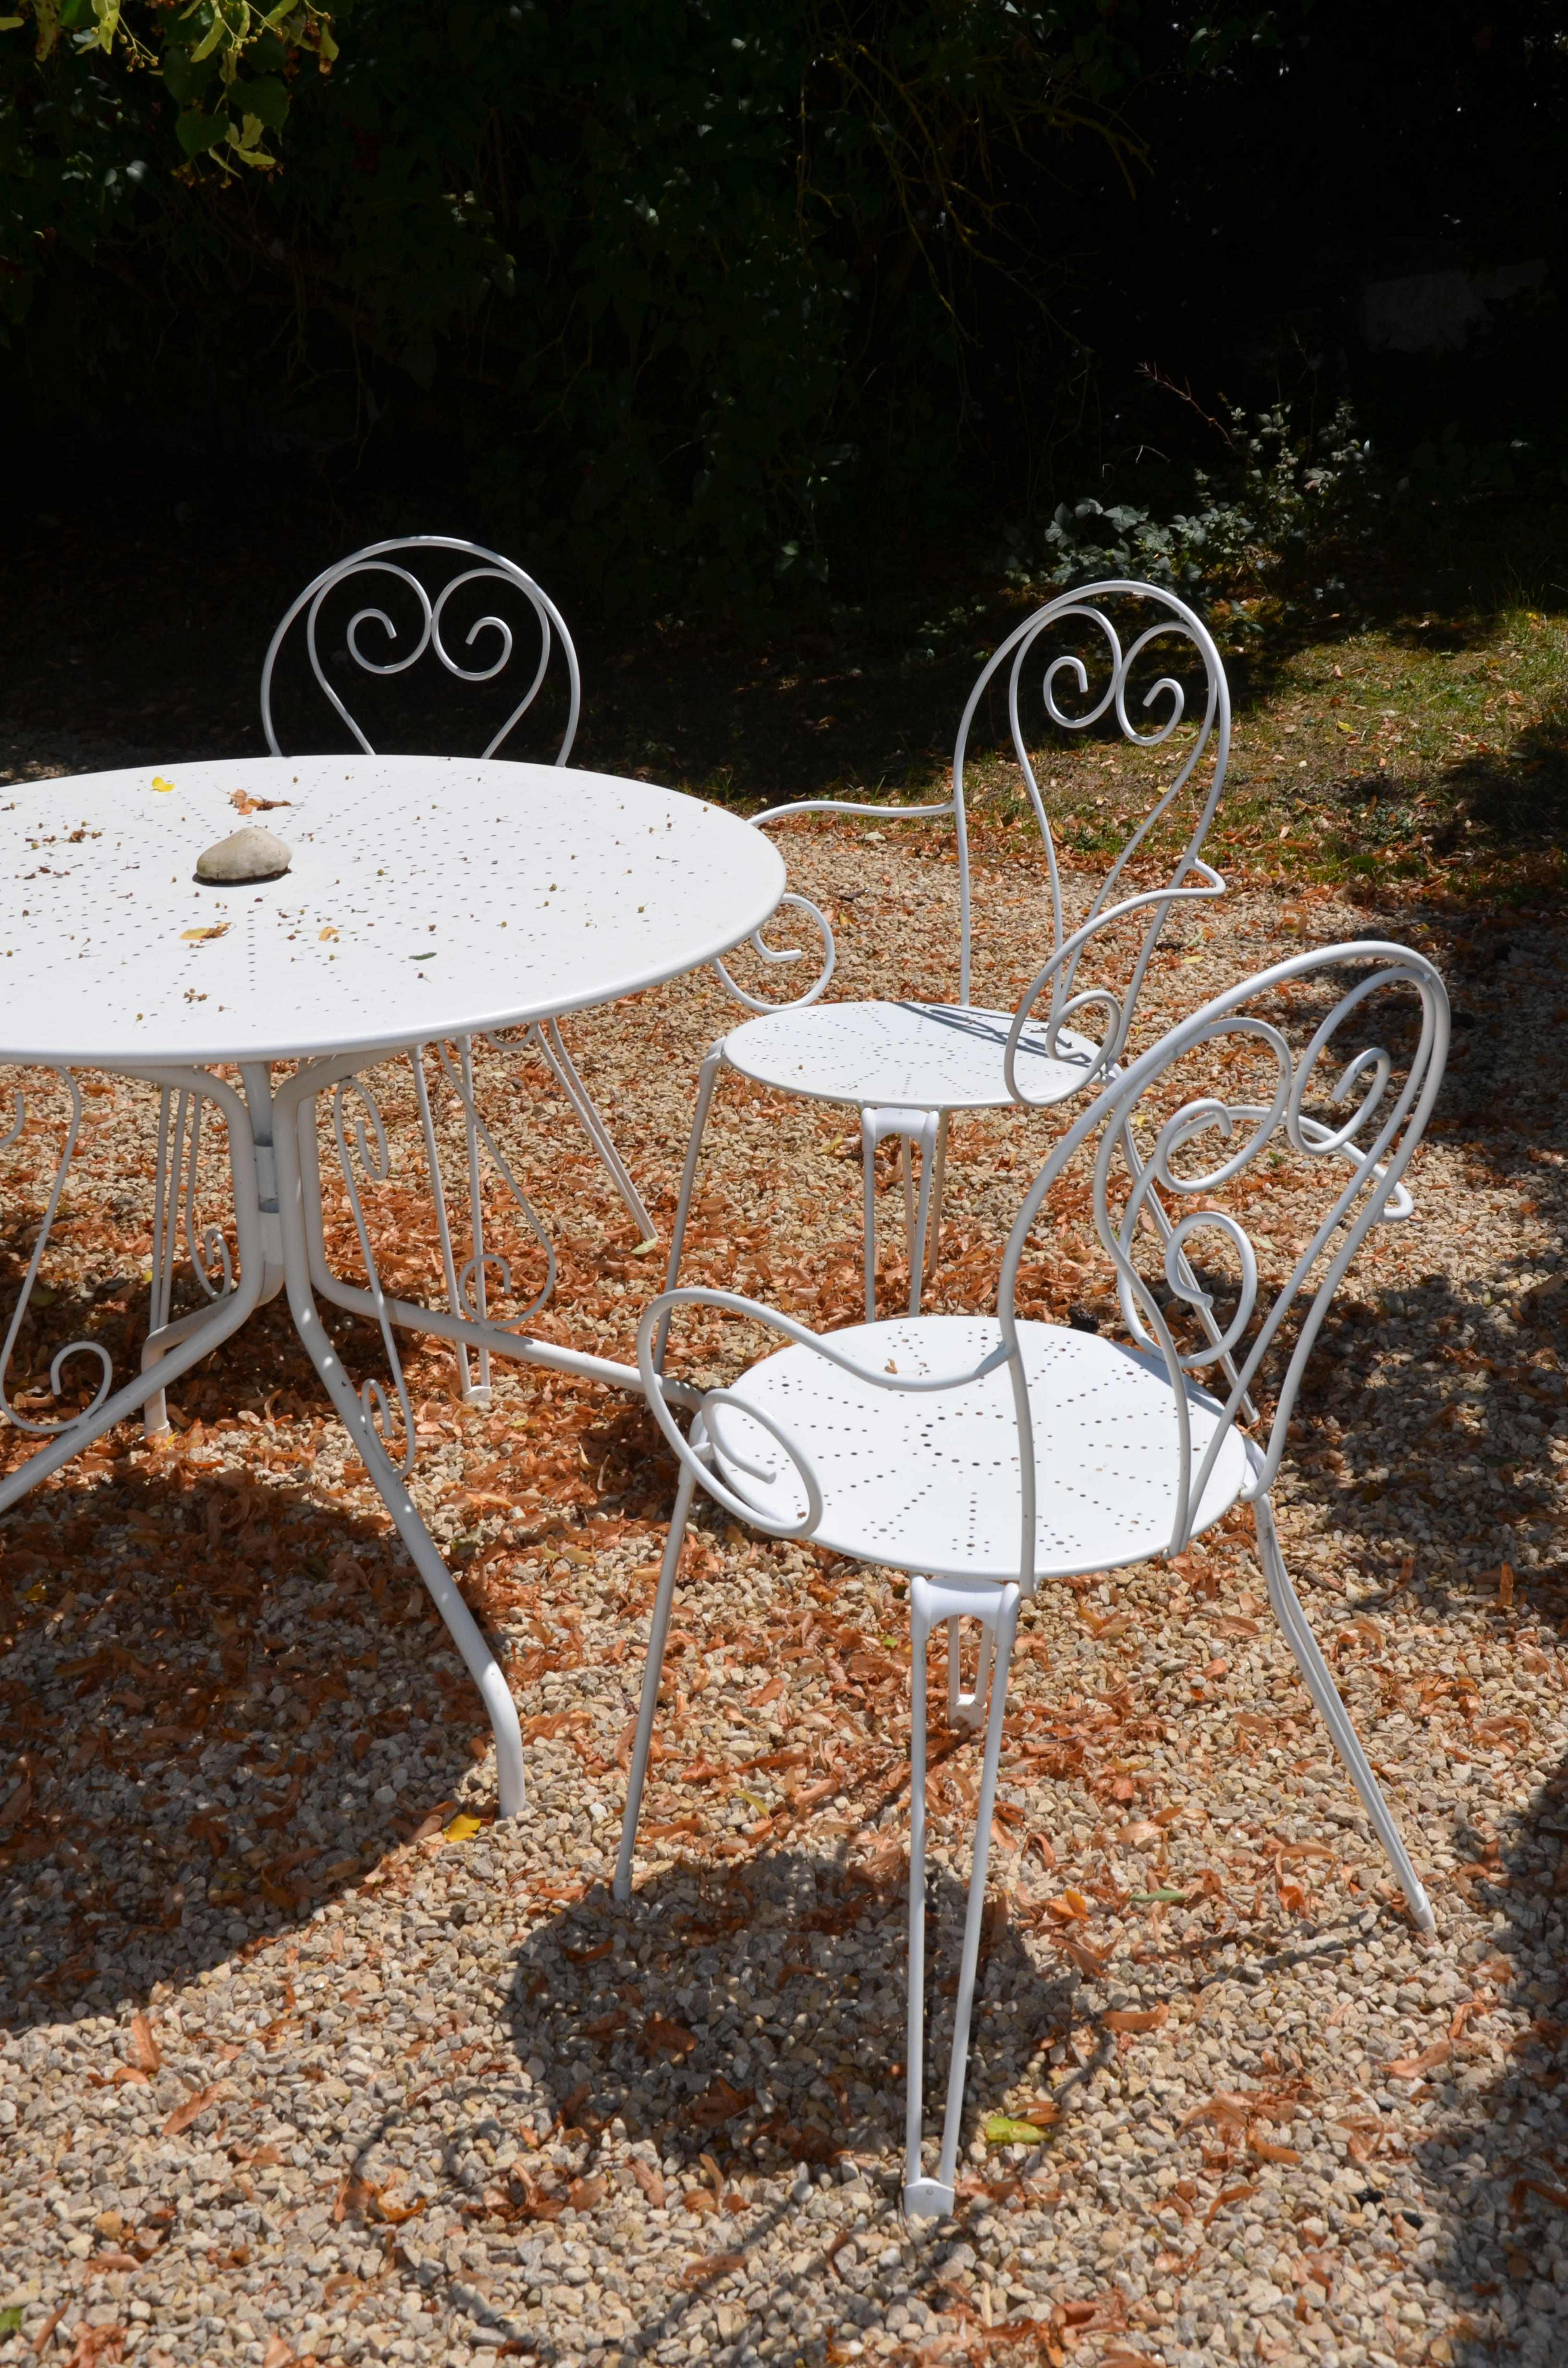 Mobilier de jardin — Wikipédia